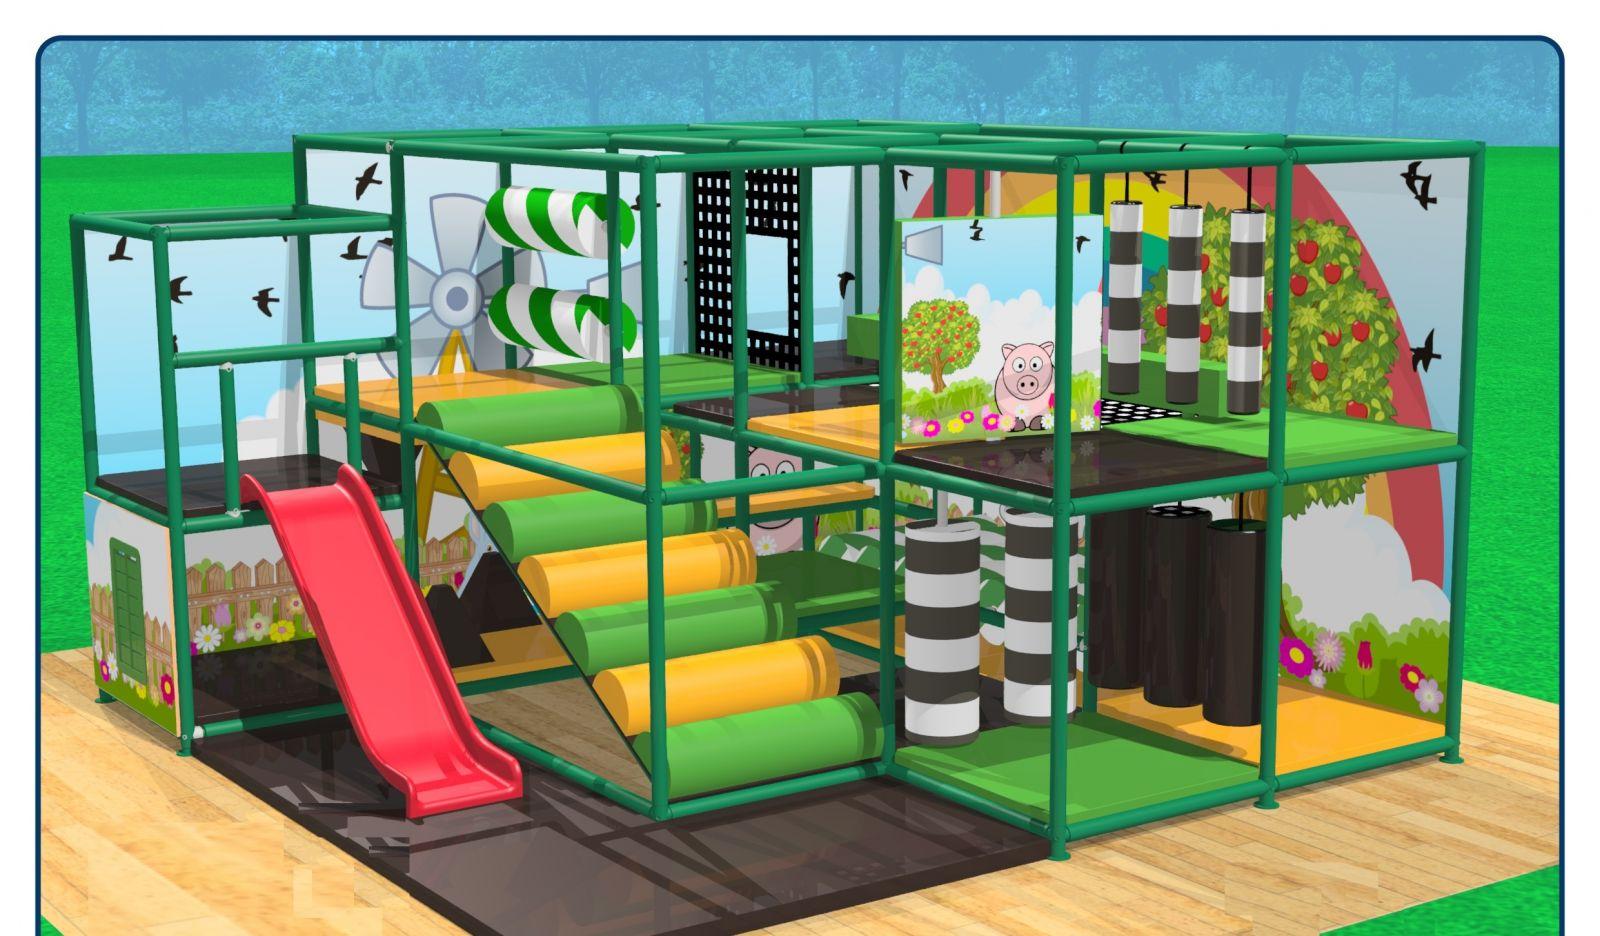 gartencafe tuincentrum dani ls. Black Bedroom Furniture Sets. Home Design Ideas